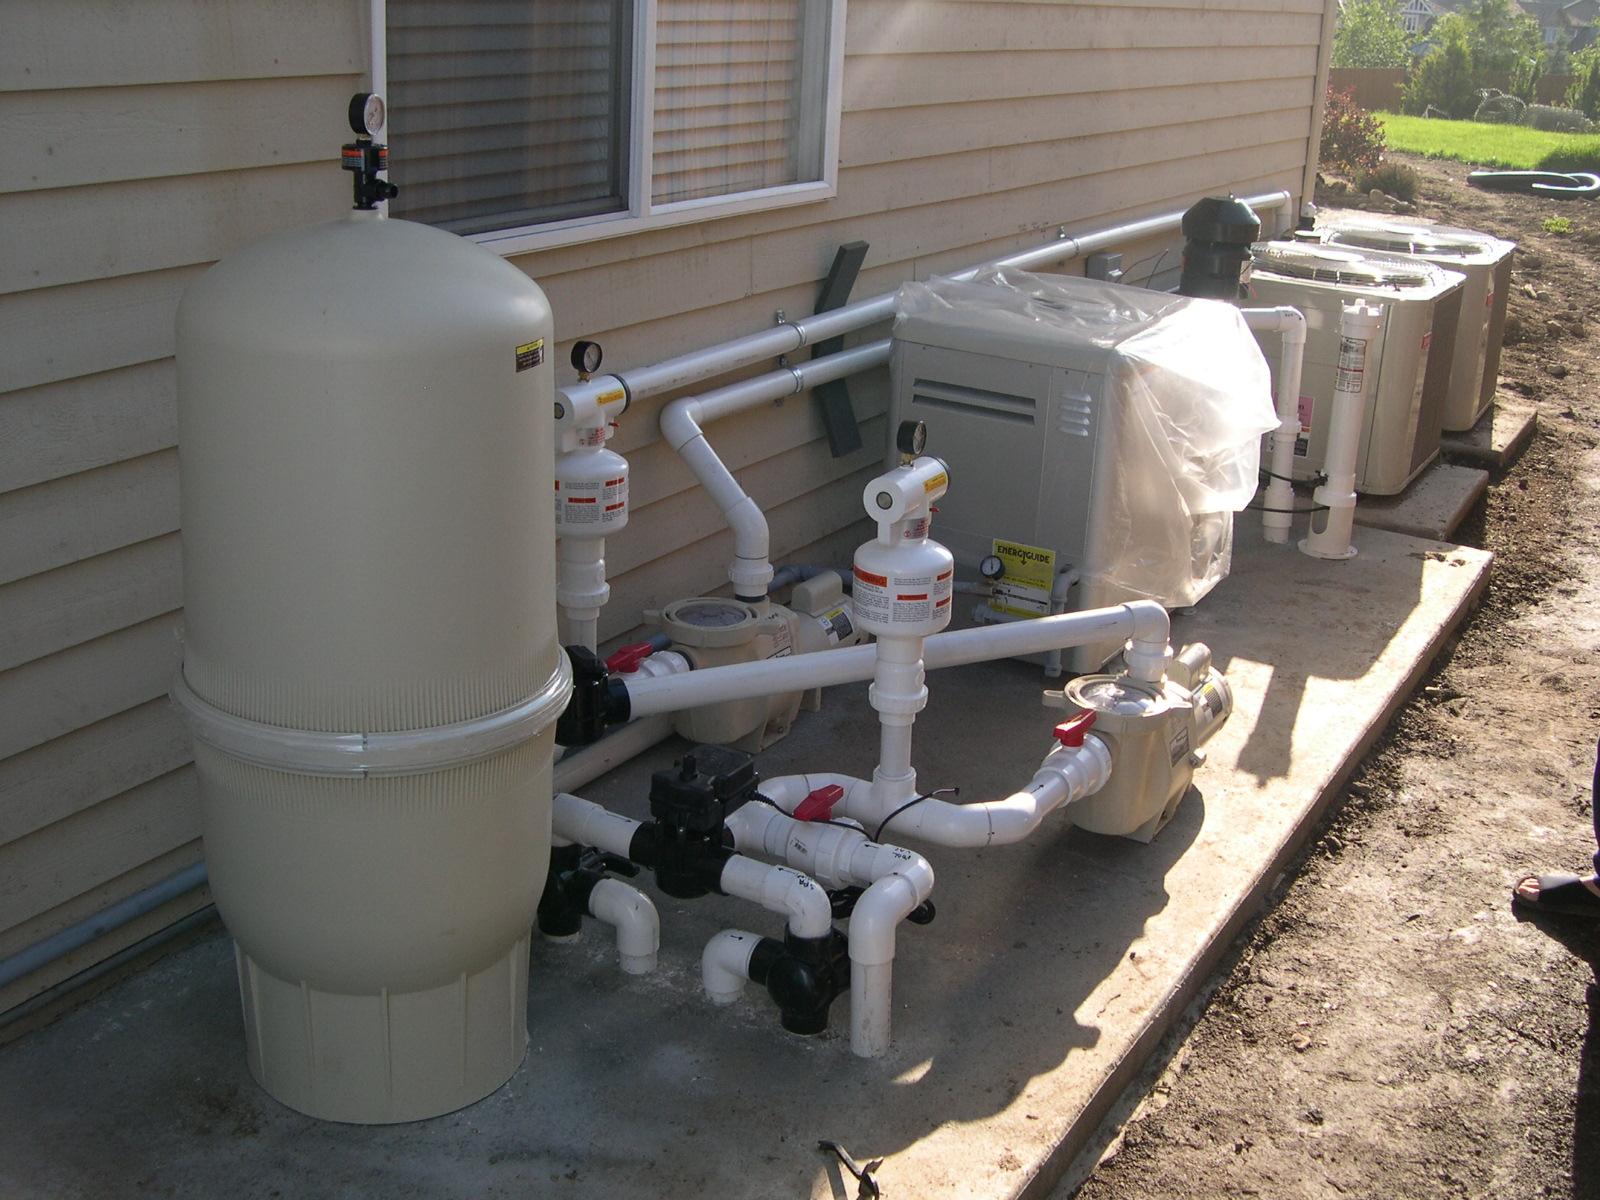 Equipment and Plumbing